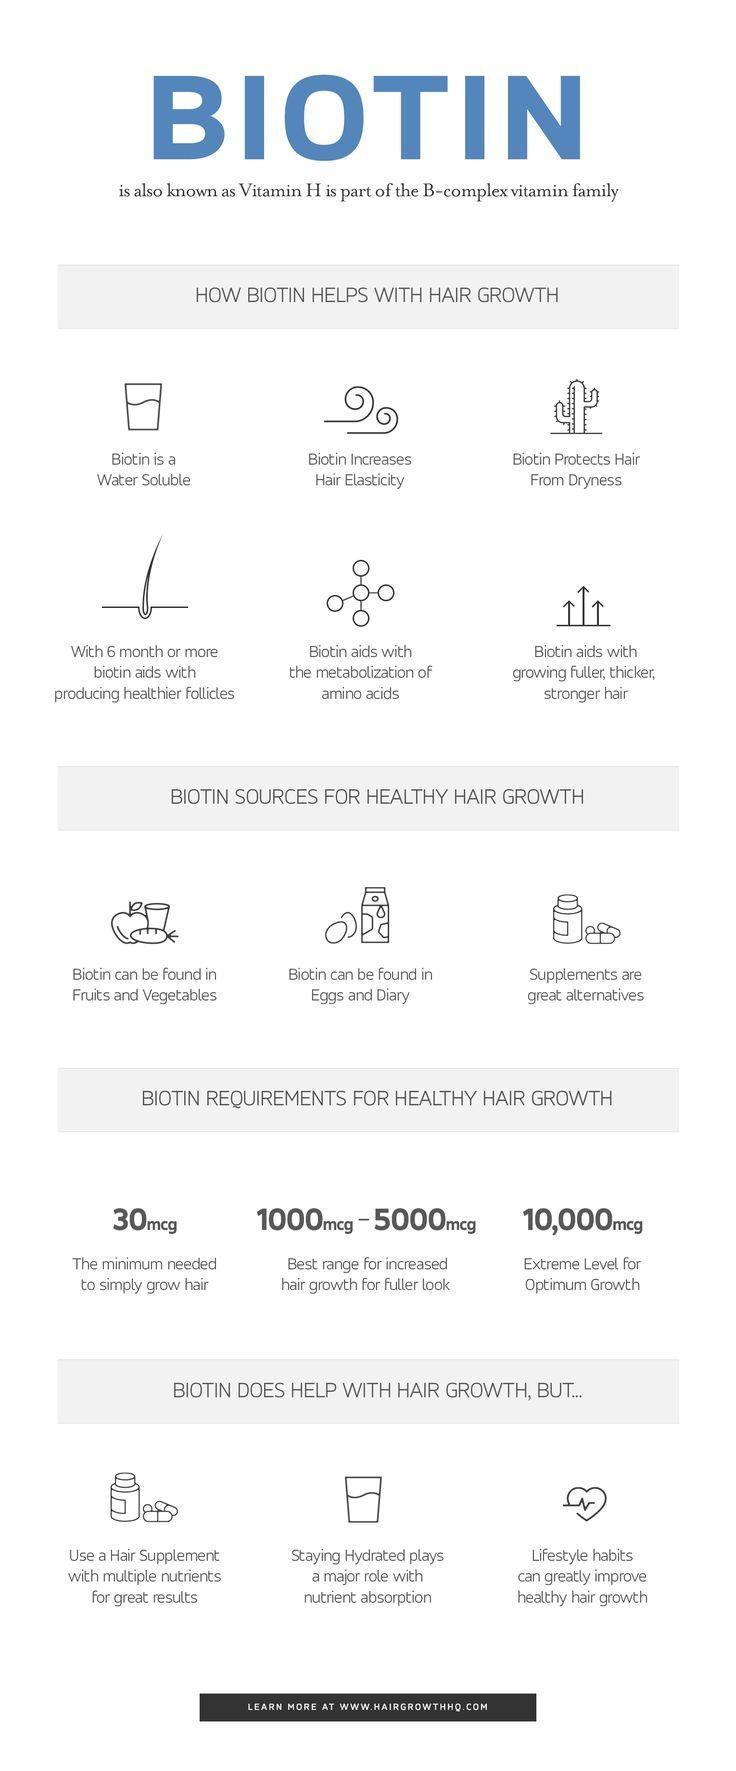 Biotin and Hair Growth - How Biotin helps with healthy hair growth | http://Hairgrowthhq.com